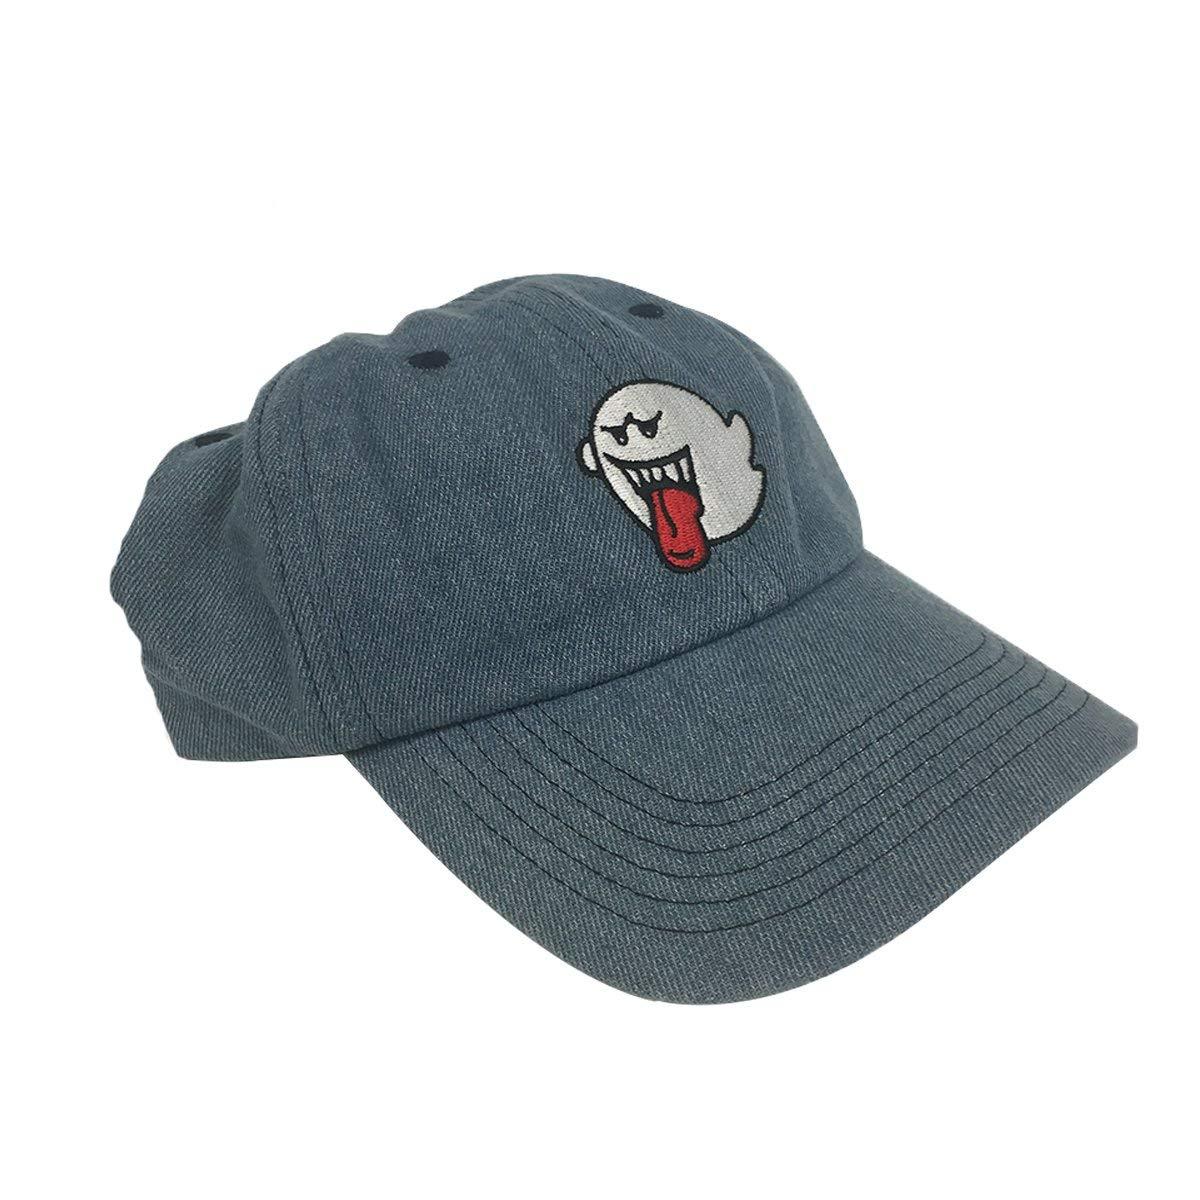 b2c26316115 Get Quotations · MyPartyShirt Ghost Boo Blue Denim Hat Baseball Cap Super  Mario Bros Dad Buckle Teresa Gift